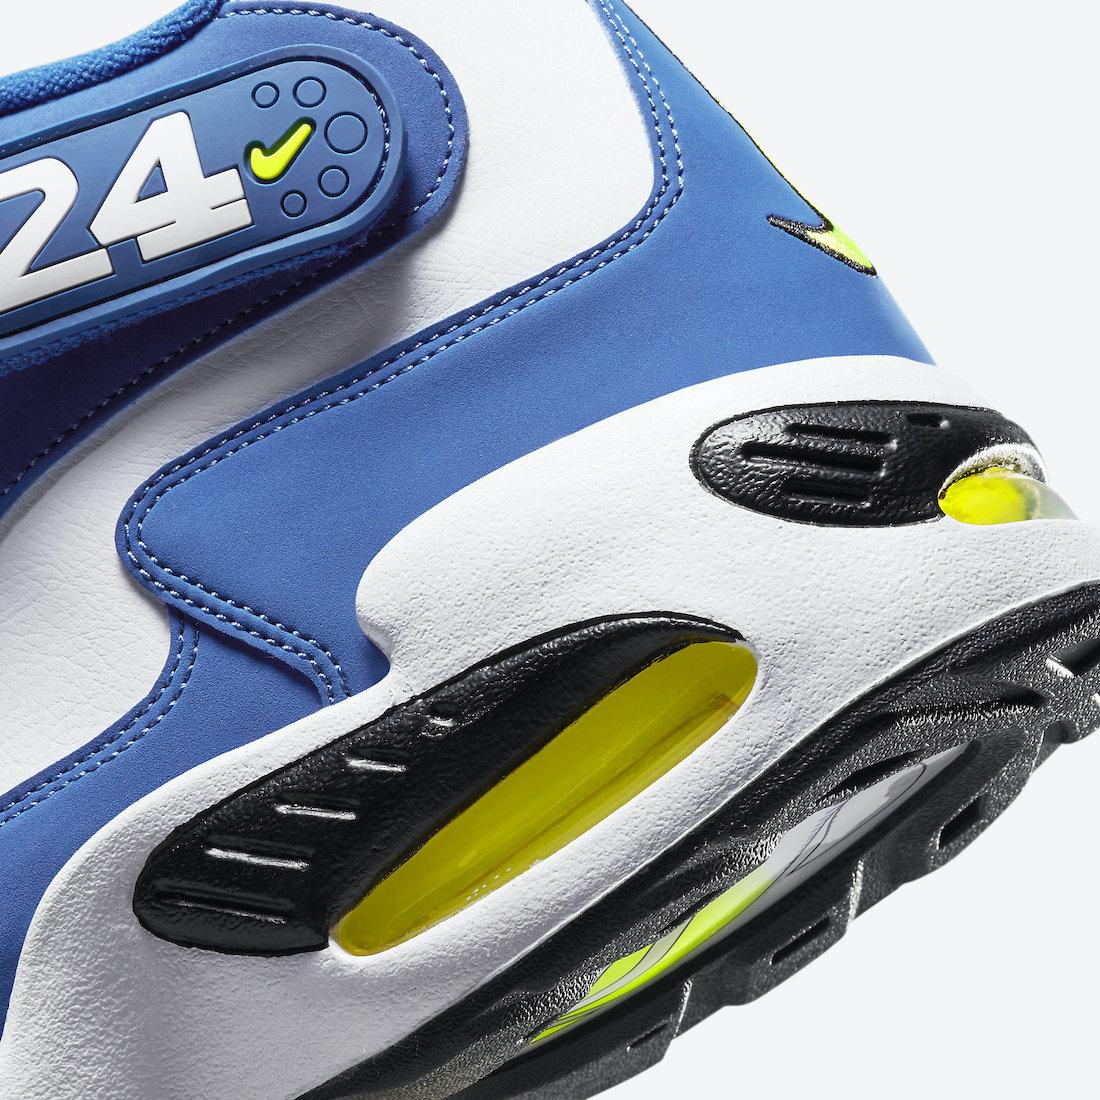 Nike-Air-Griffey-Max-1-Varsity-Royal-DJ5161-400-2021-Release-Date-7